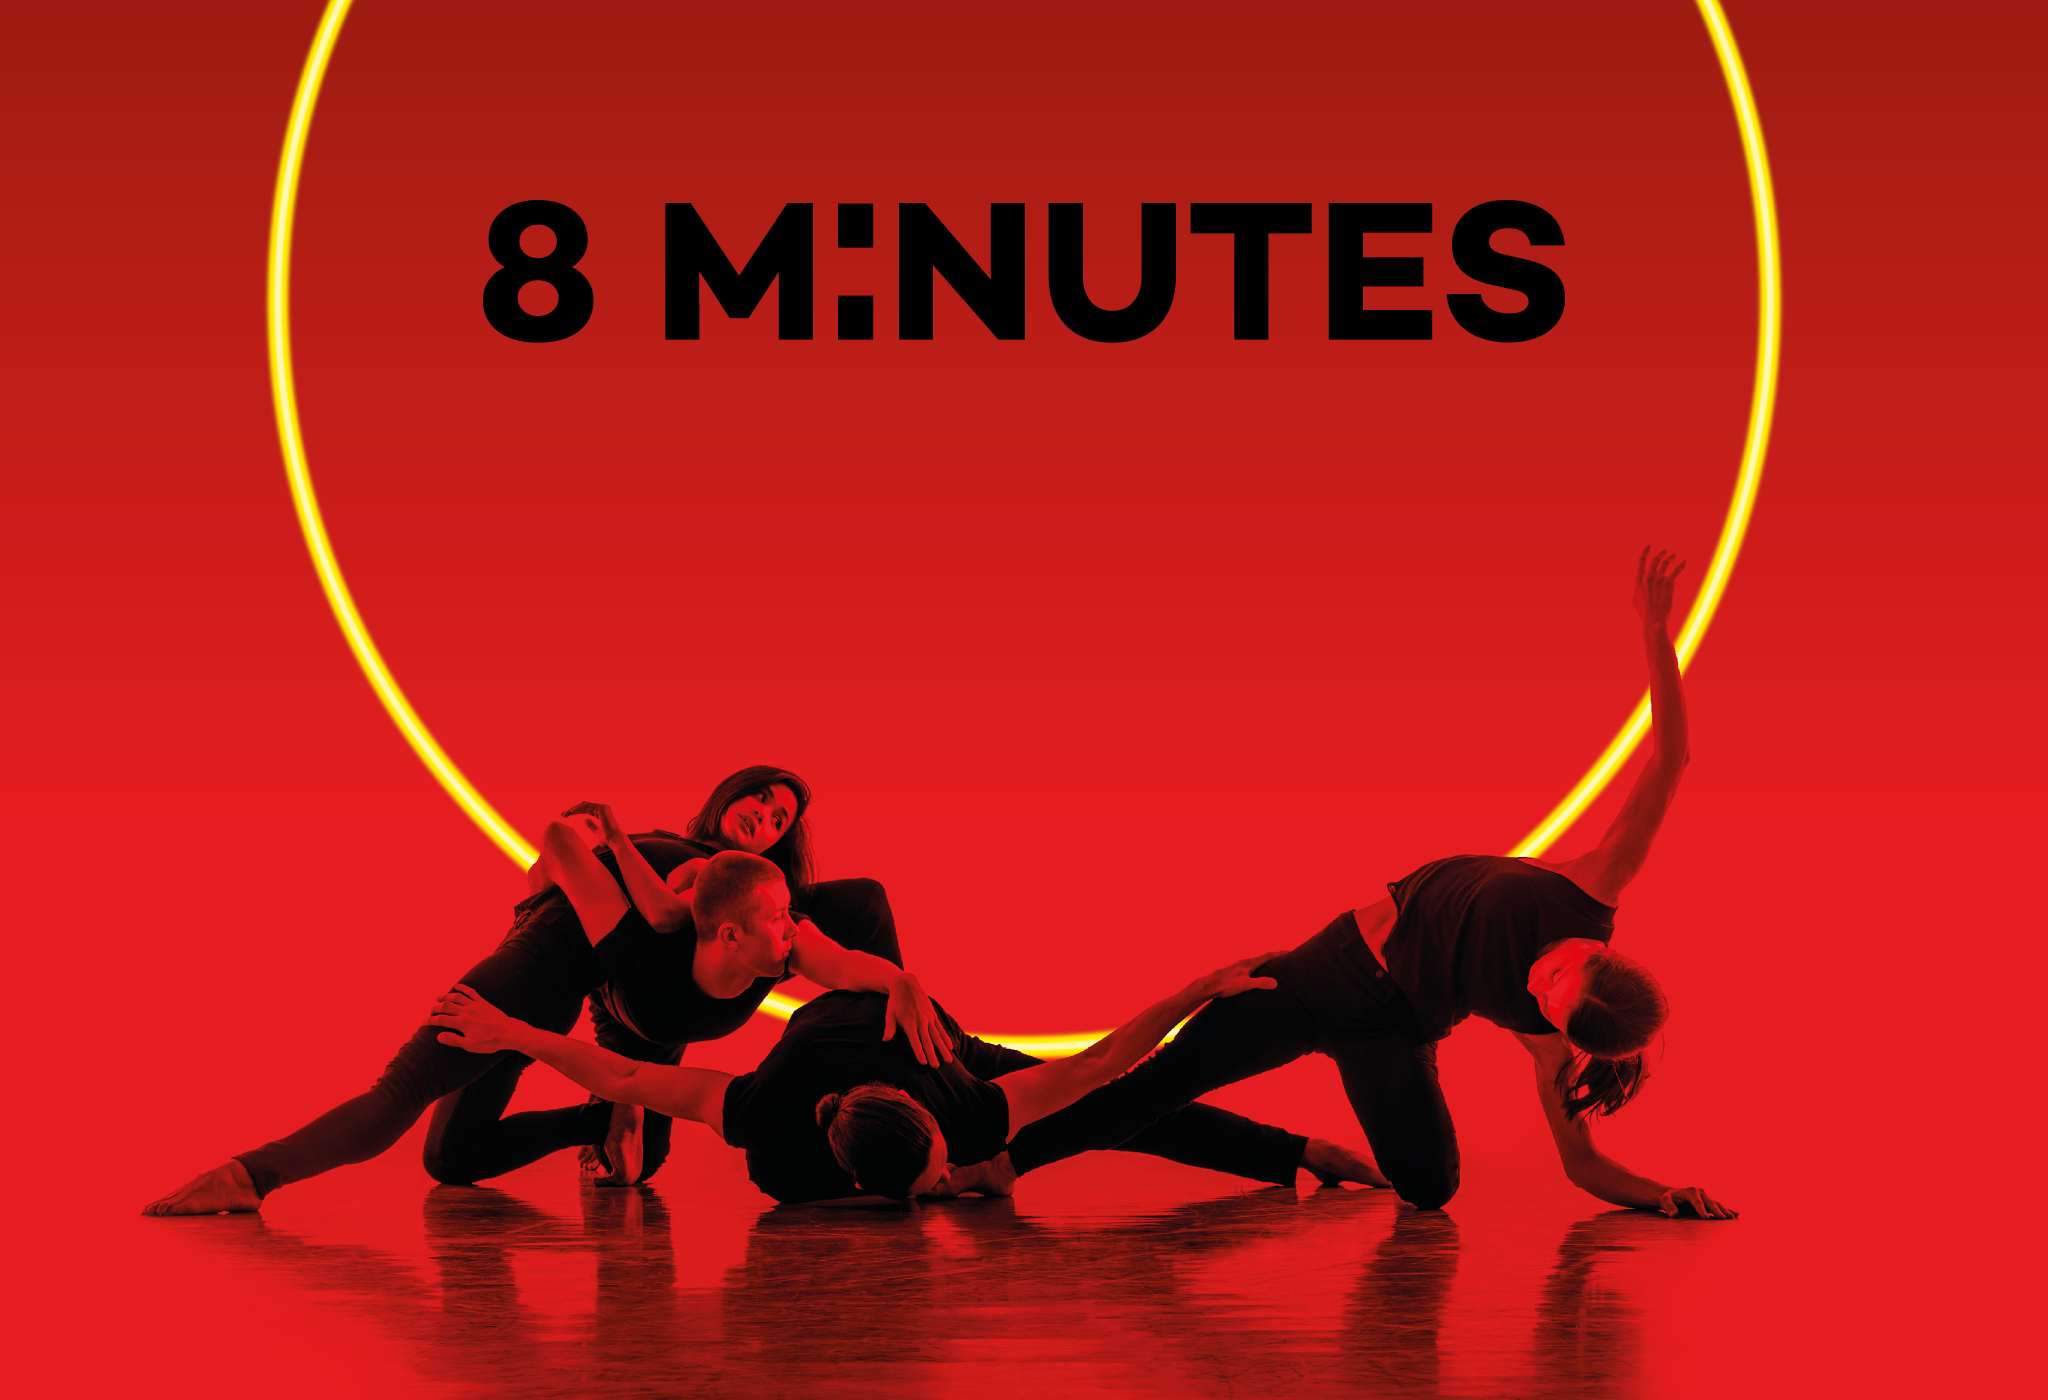 8-Minutes-RGB-1.png